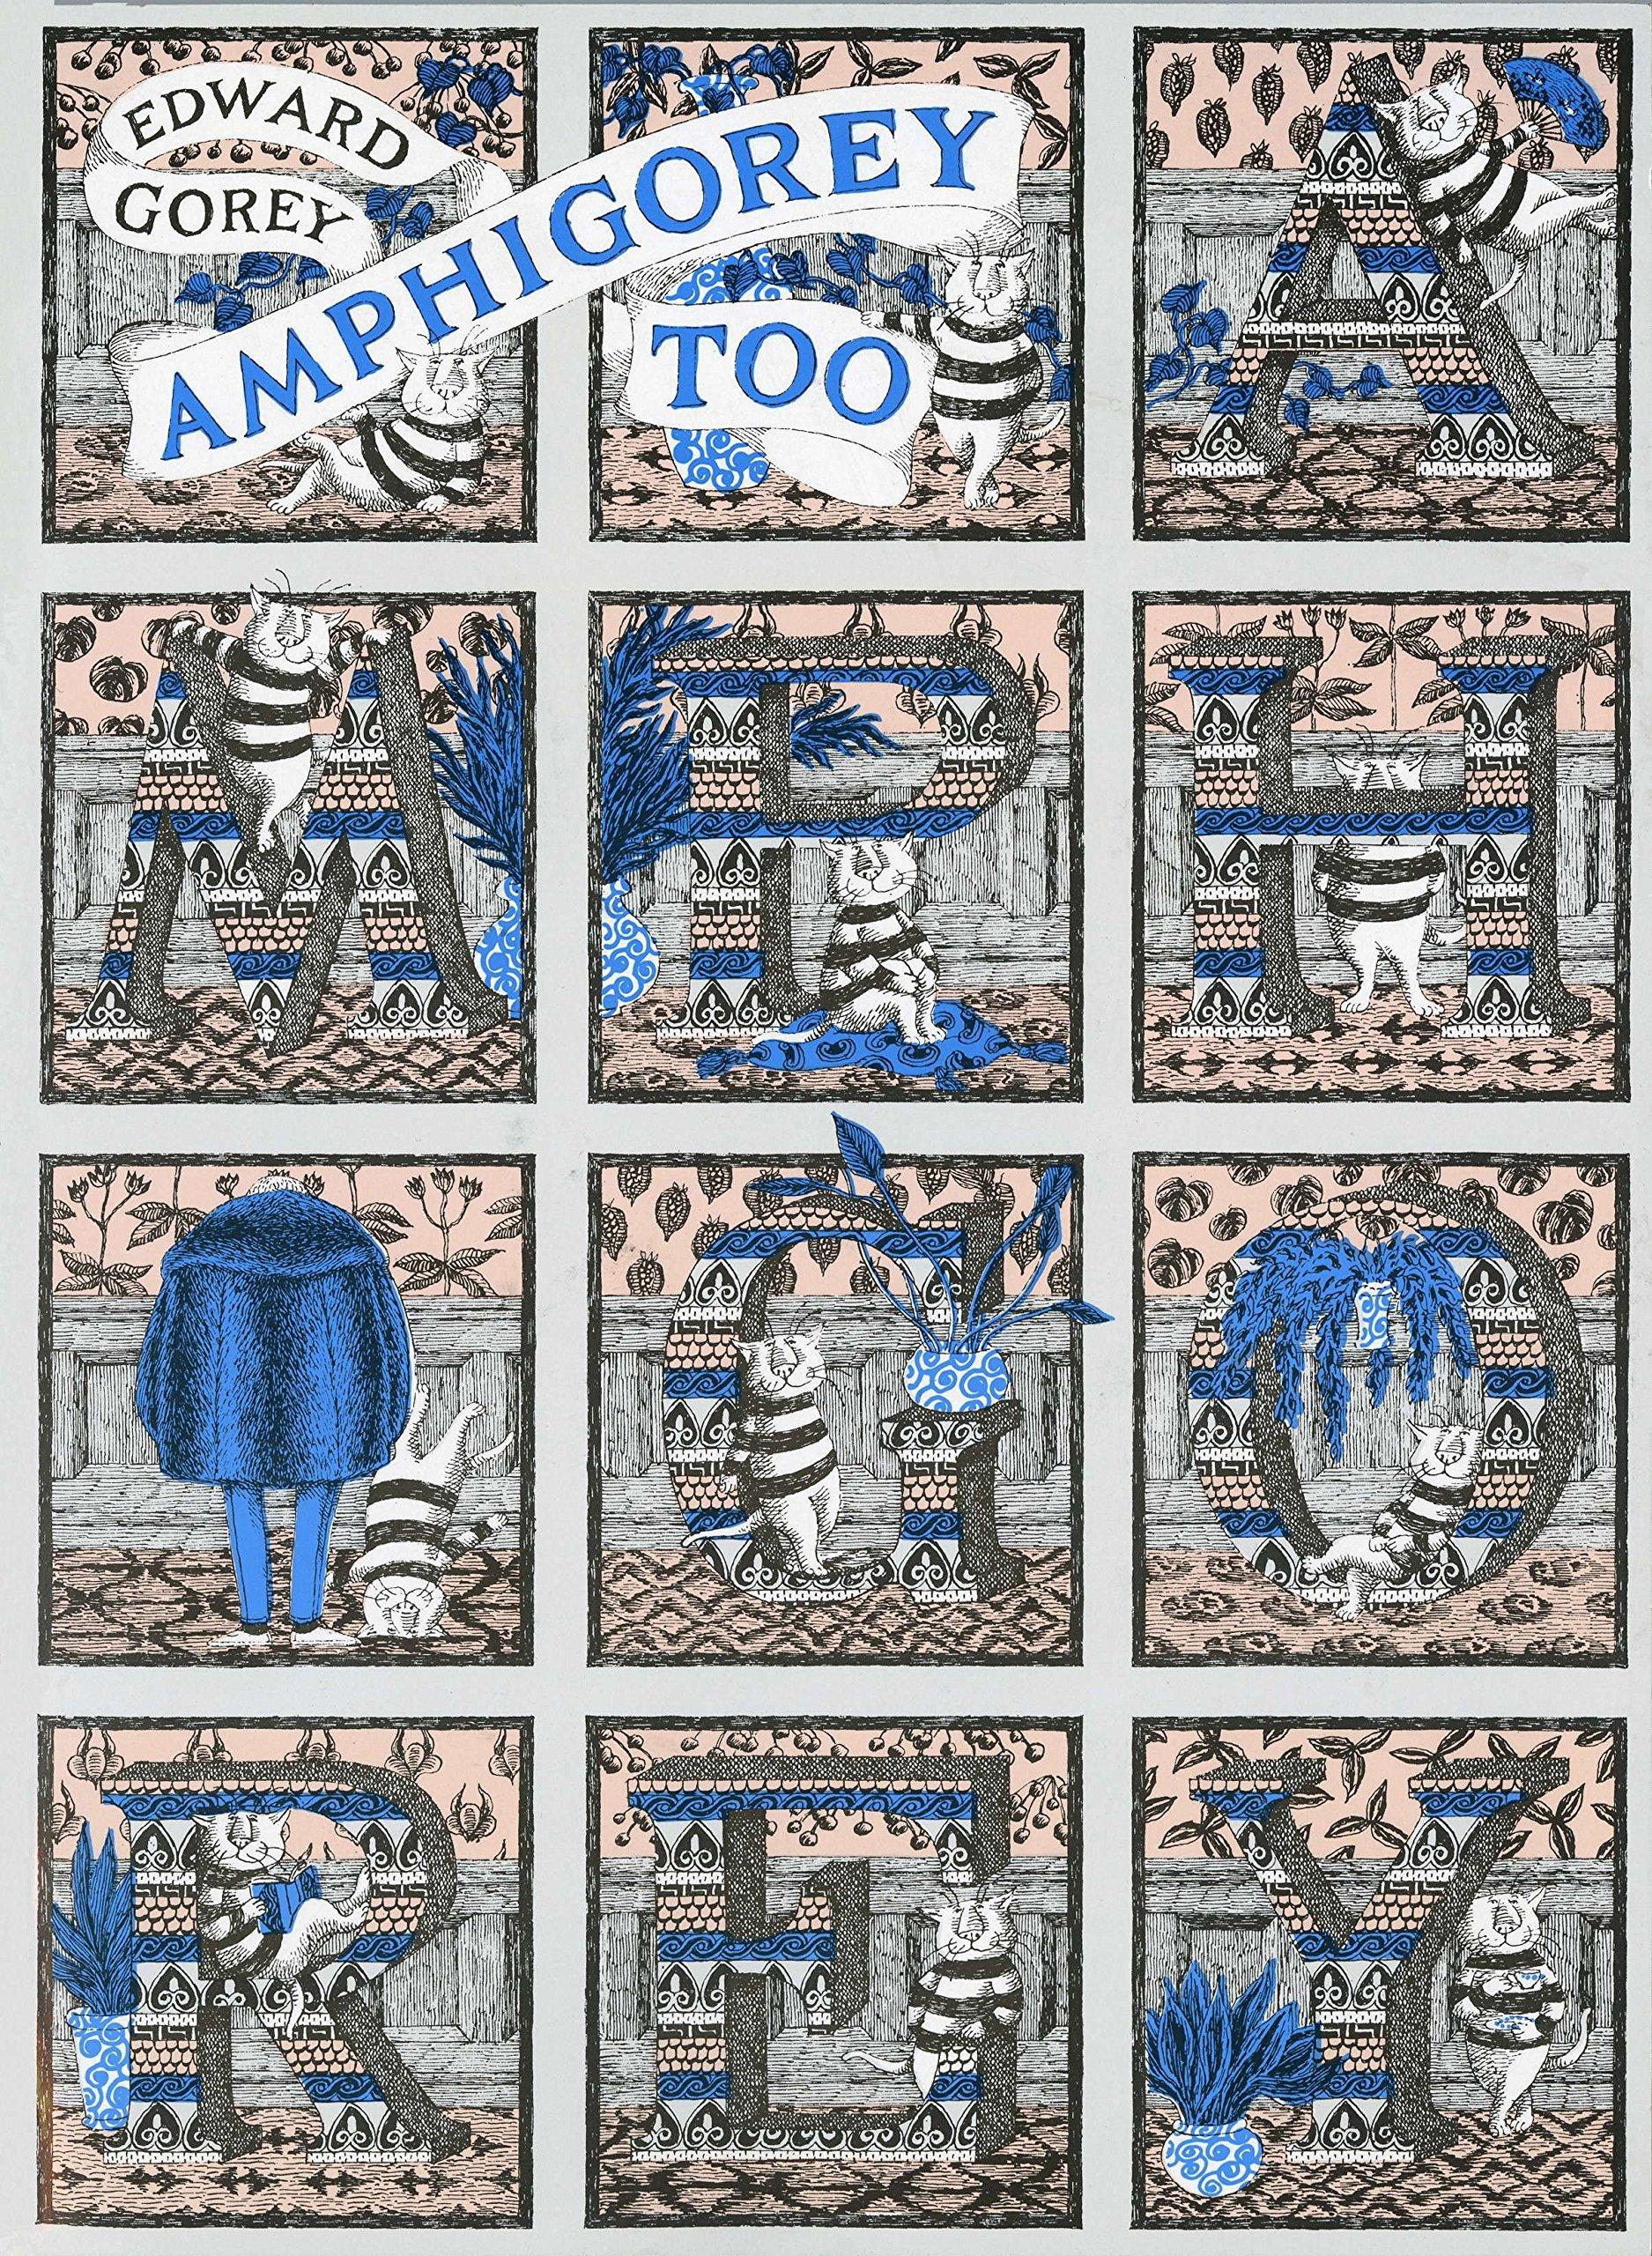 Amphigorey Too by Perigee Books